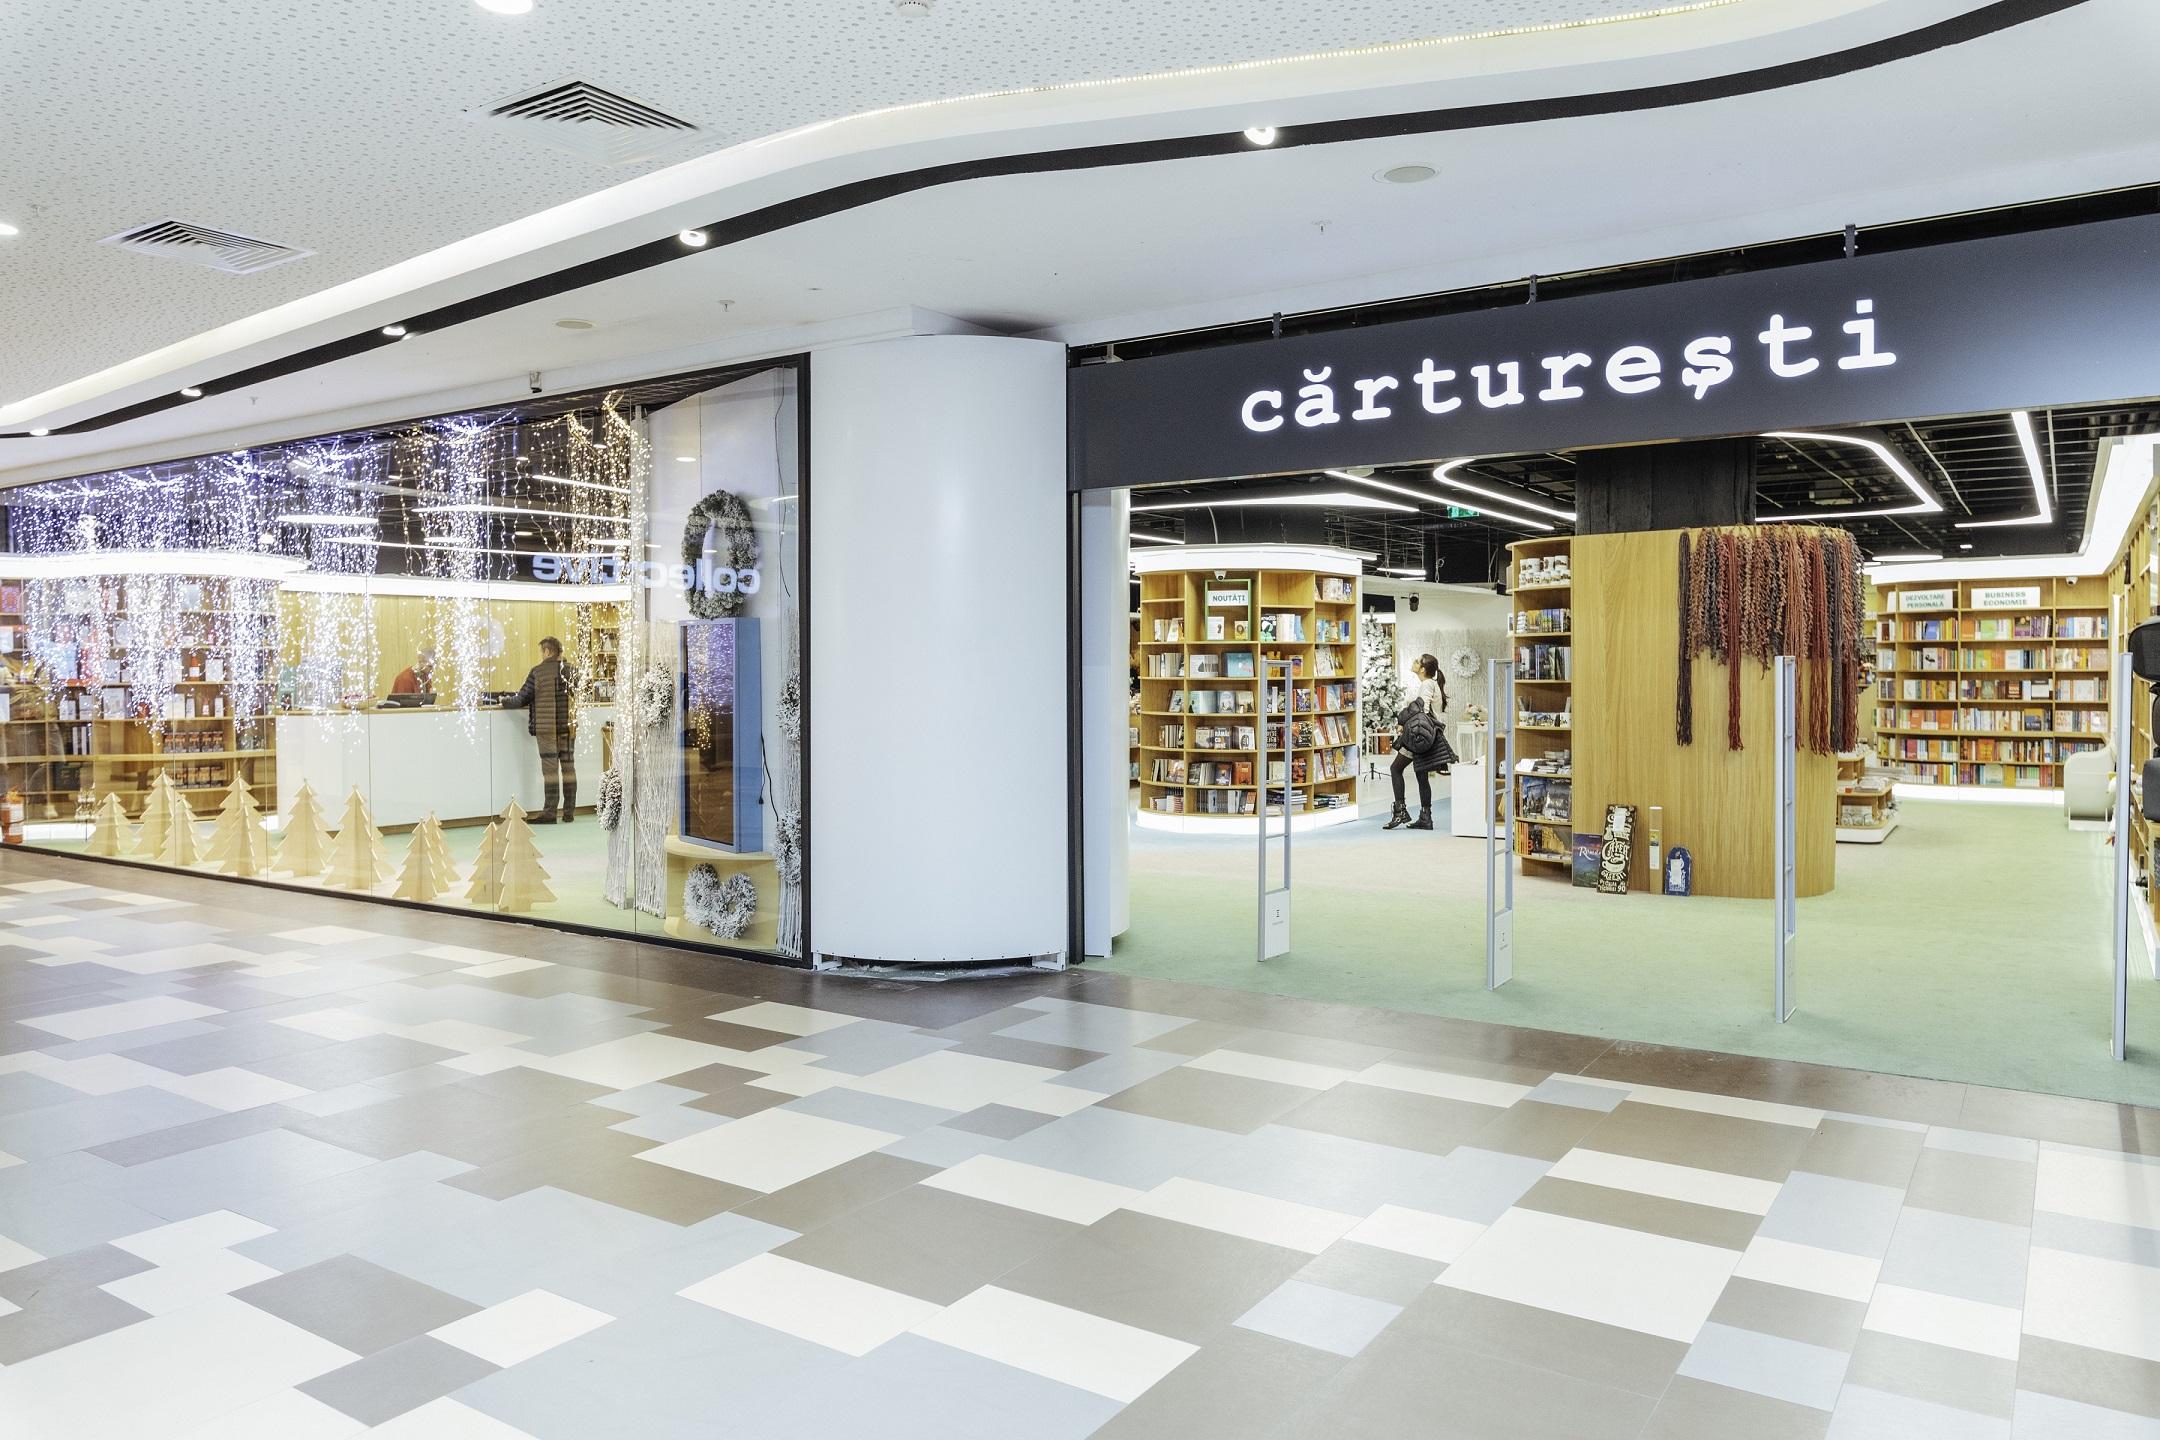 Carturesti a deschis o librarie in Bucuresti Mall Vitan